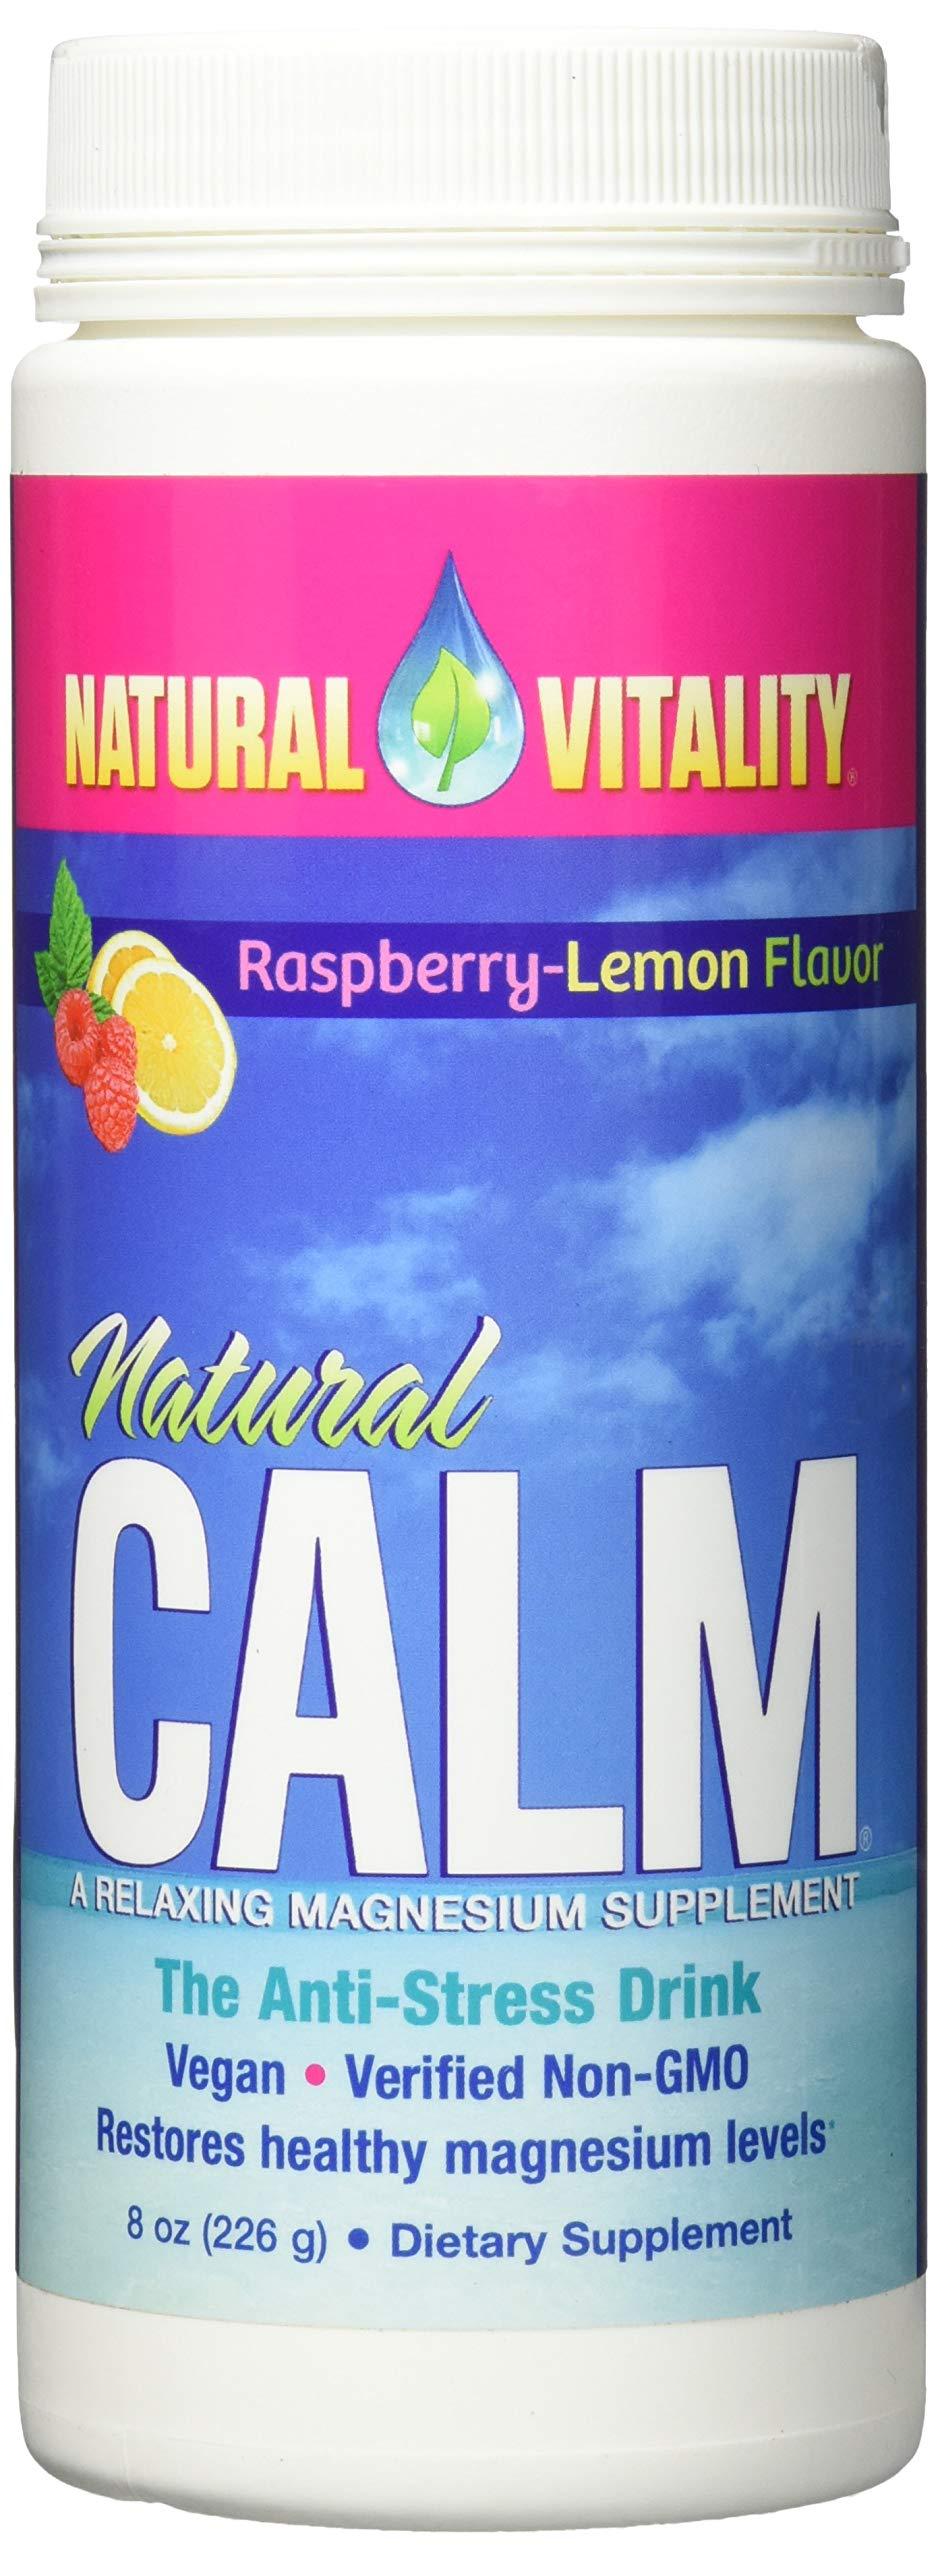 Natural Vitality Natural Calm Magnesium Anti Stress, Organic, Raspberry Lemon, 8 oz